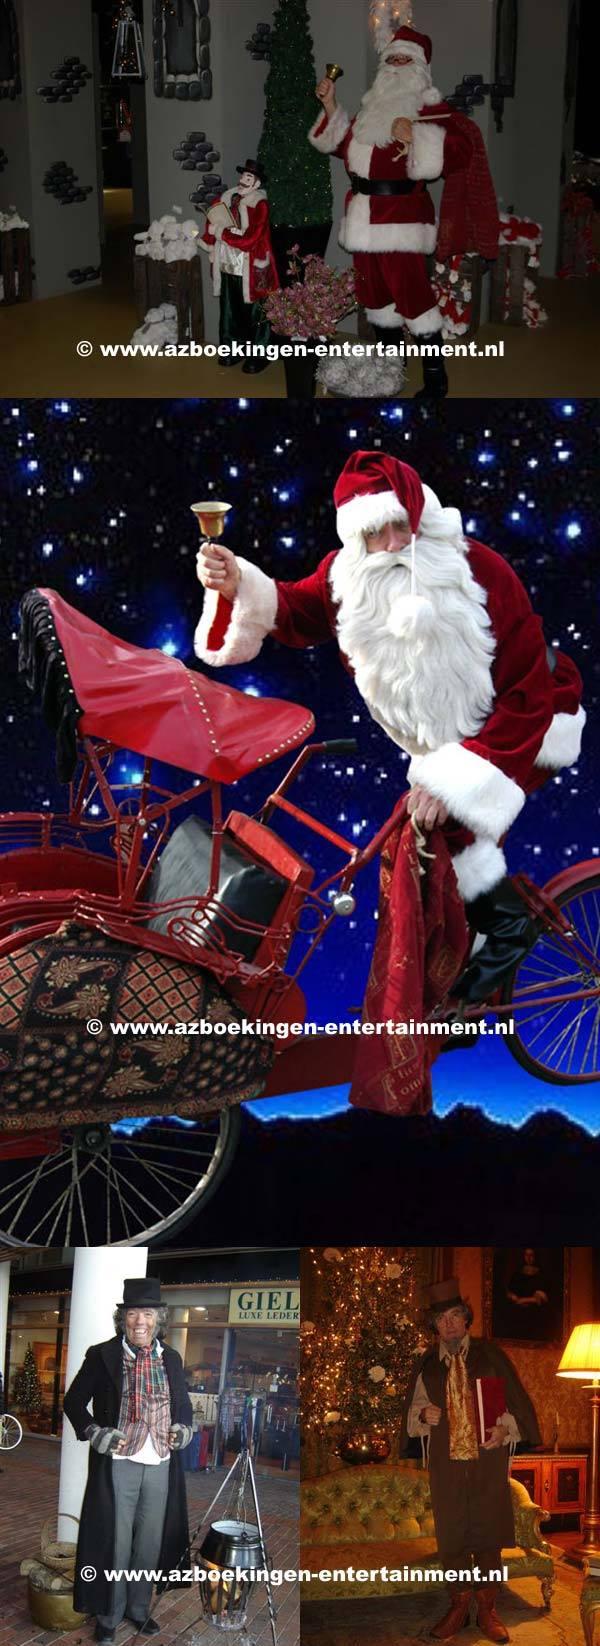 Scrooge kastanjepoffer - Kerstman op Riskja, Kerstman en of Scrooge verhalenverteller